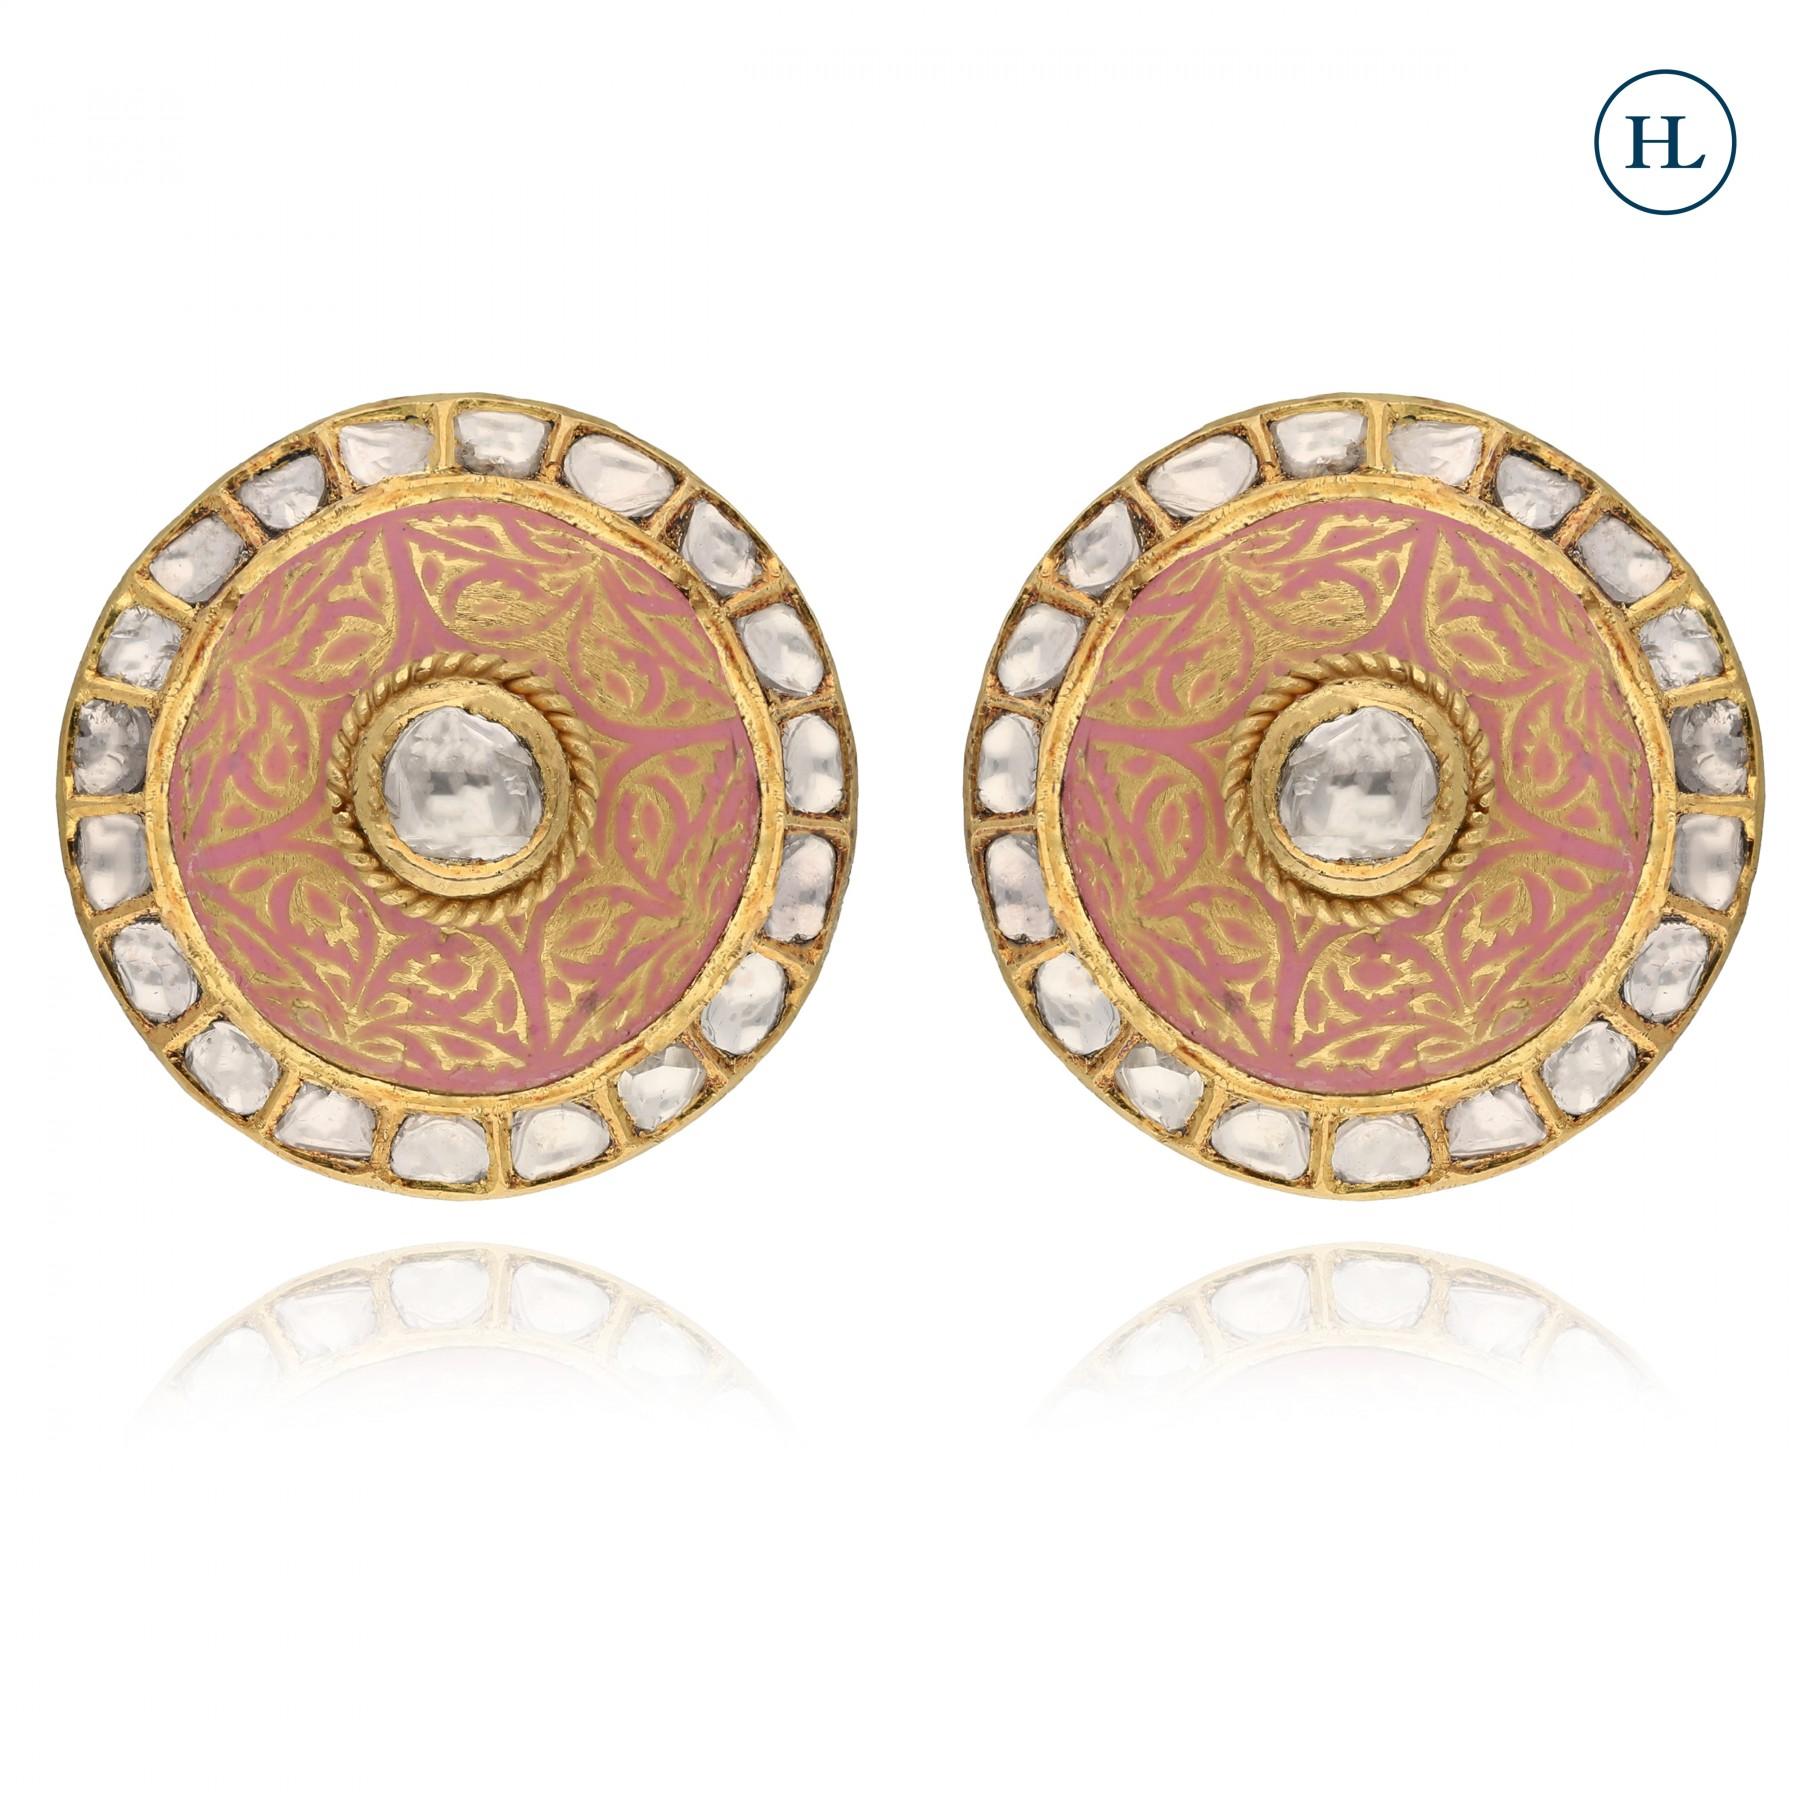 Antique-Styled Polki Enamel Earrings